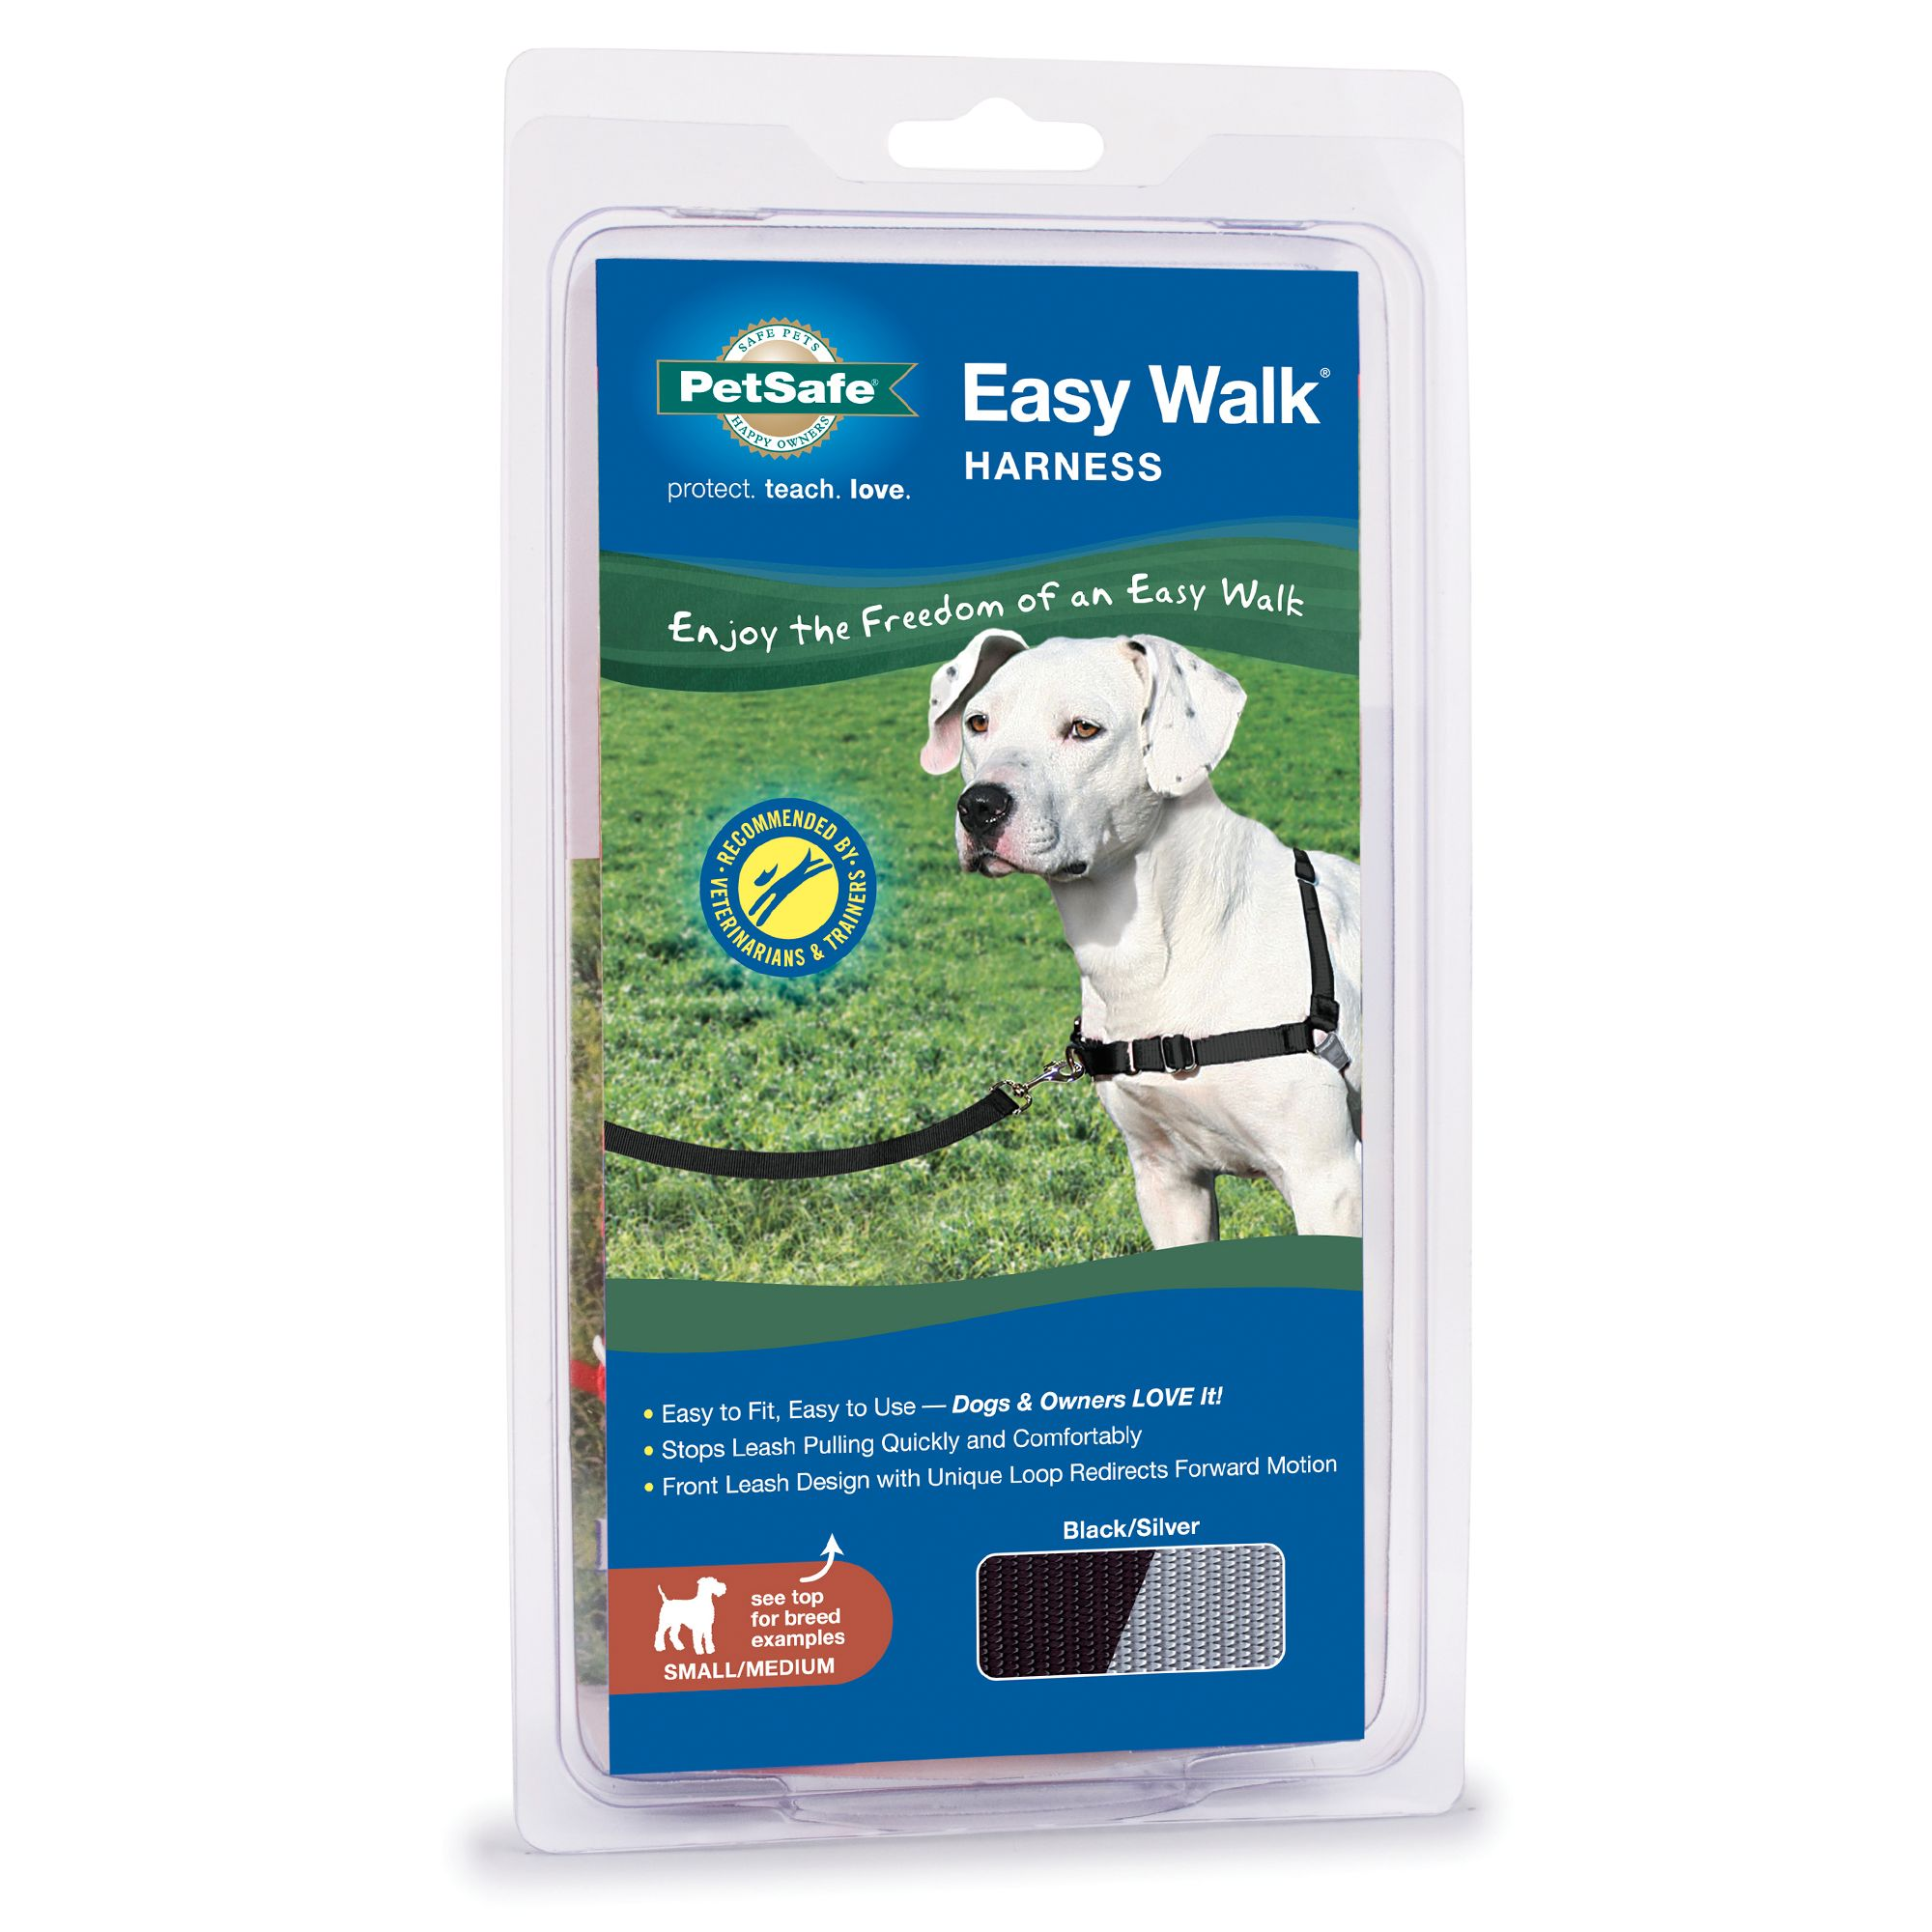 Petsmart Puppy Guide Dog Training Behavior Accessories Petsmart